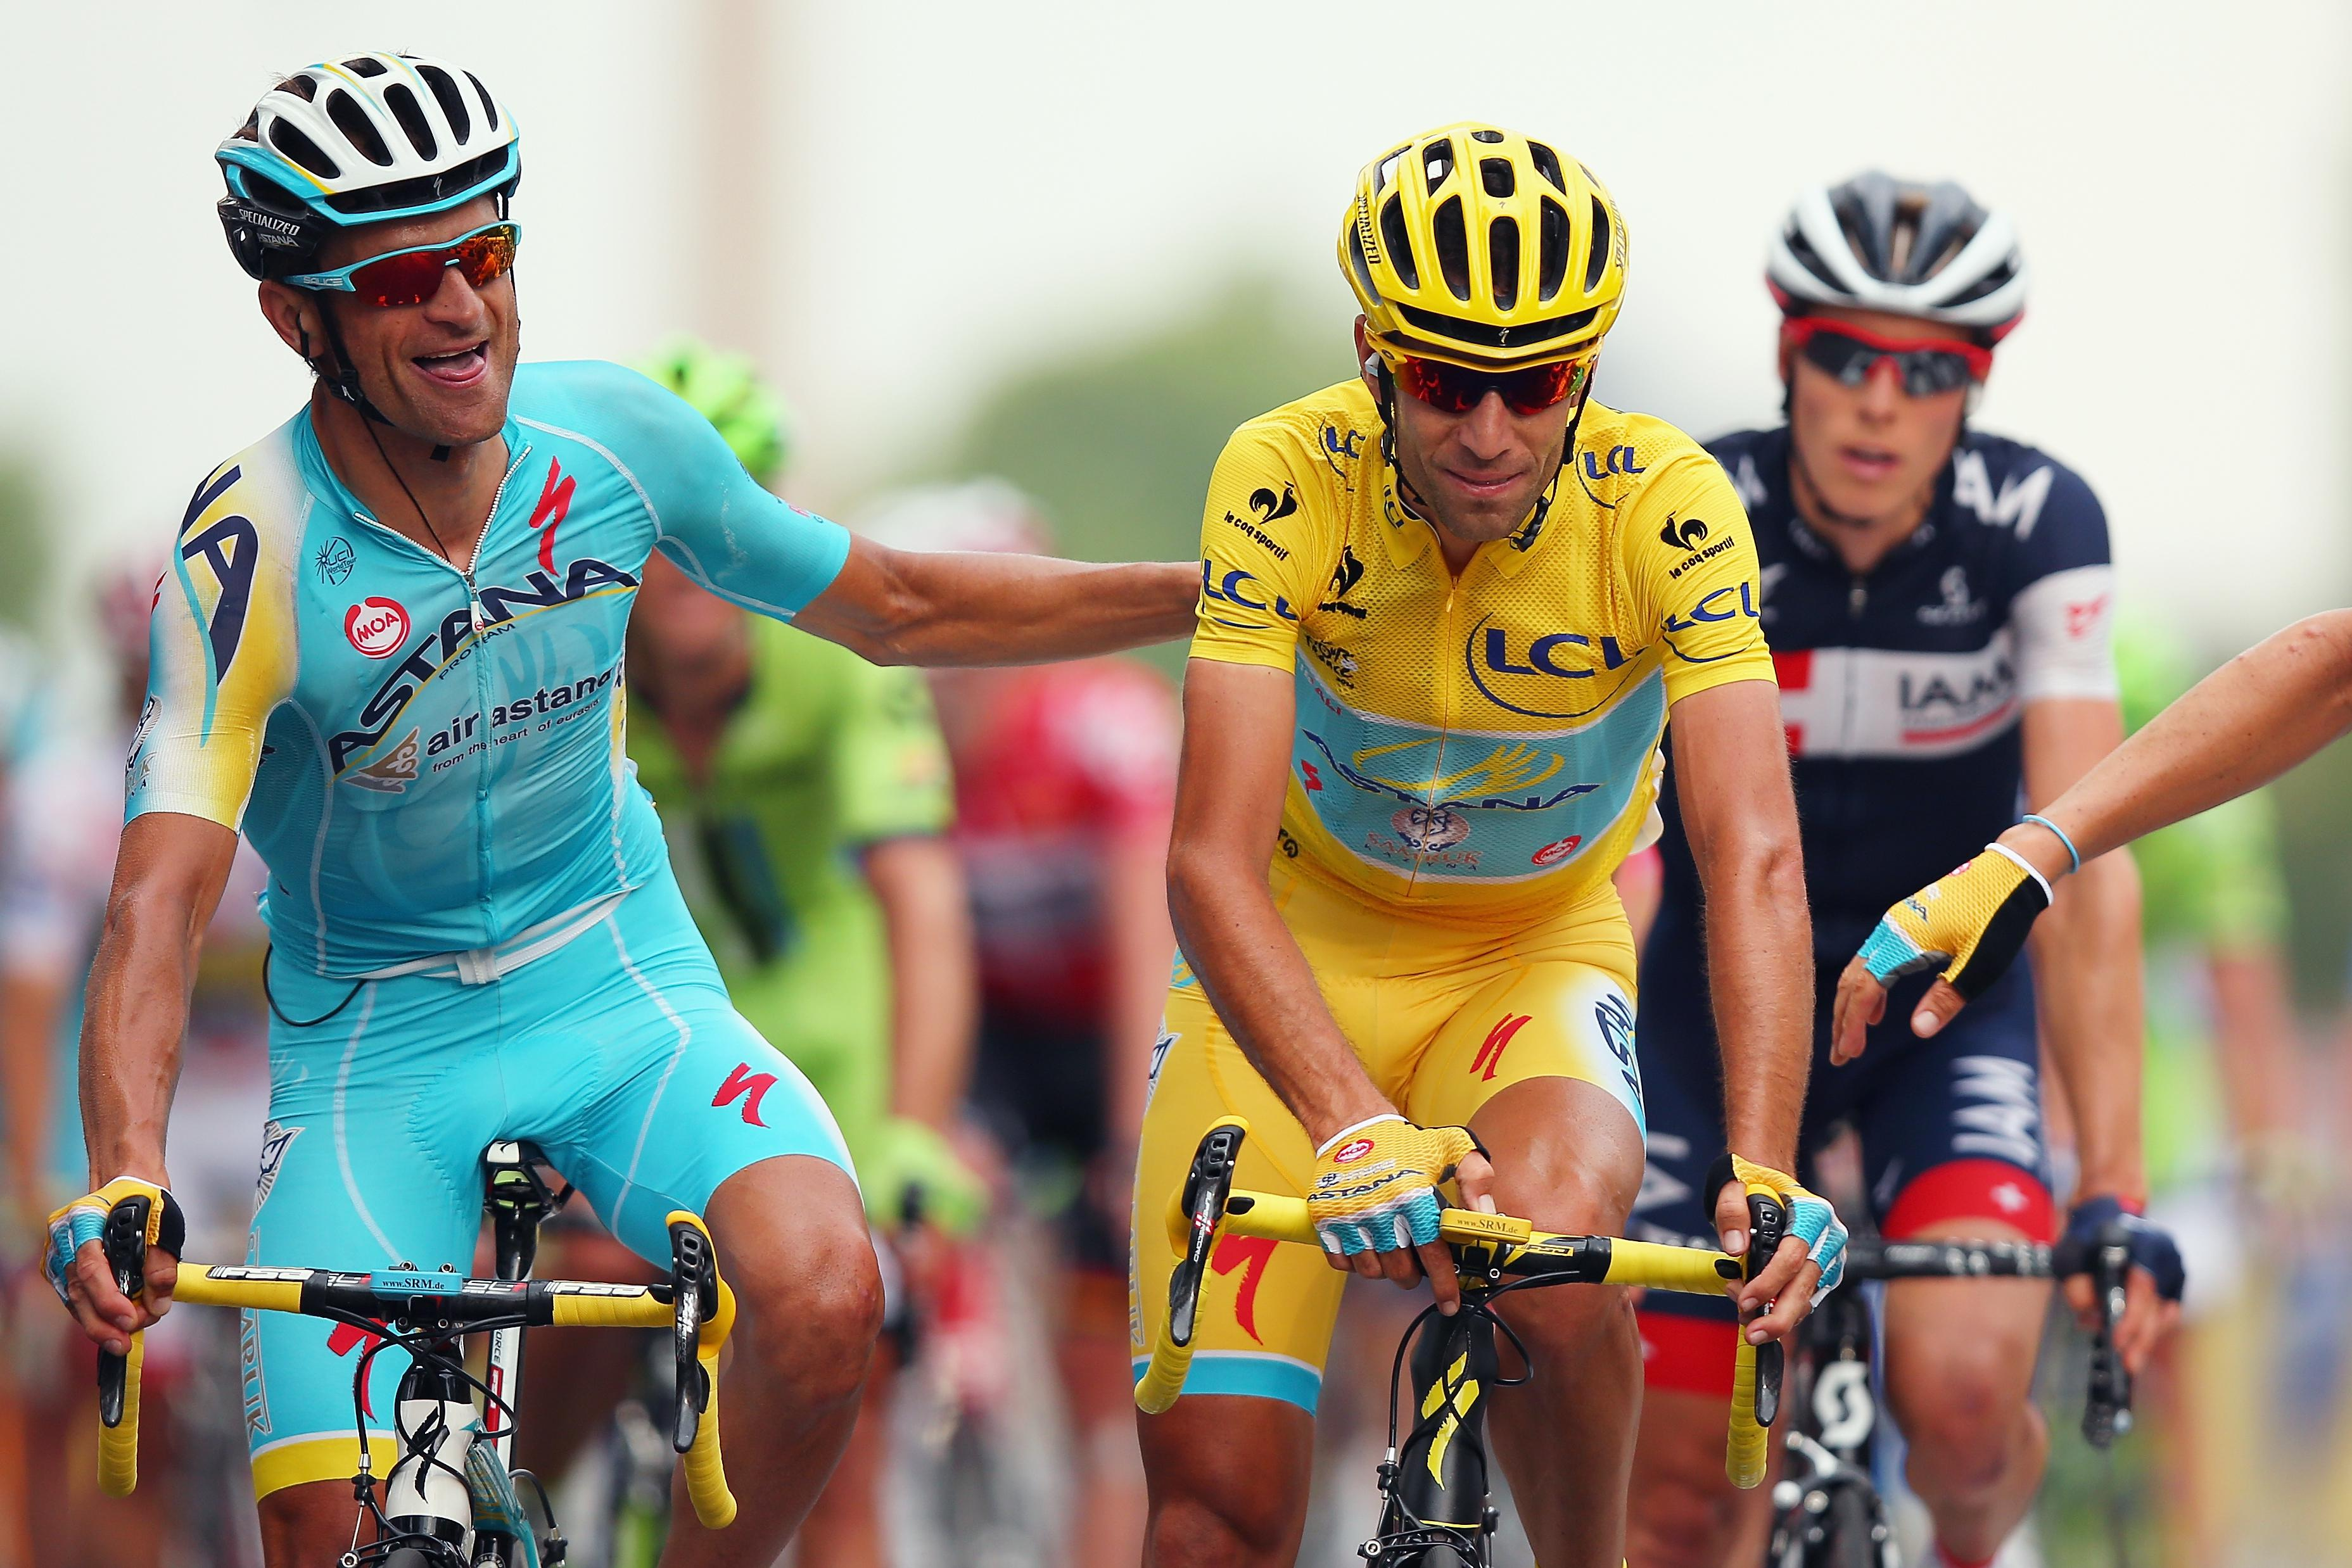 Michele Scarponi with Vincenzo Nibali when his Italian team-mate won the 2014 Tour de France